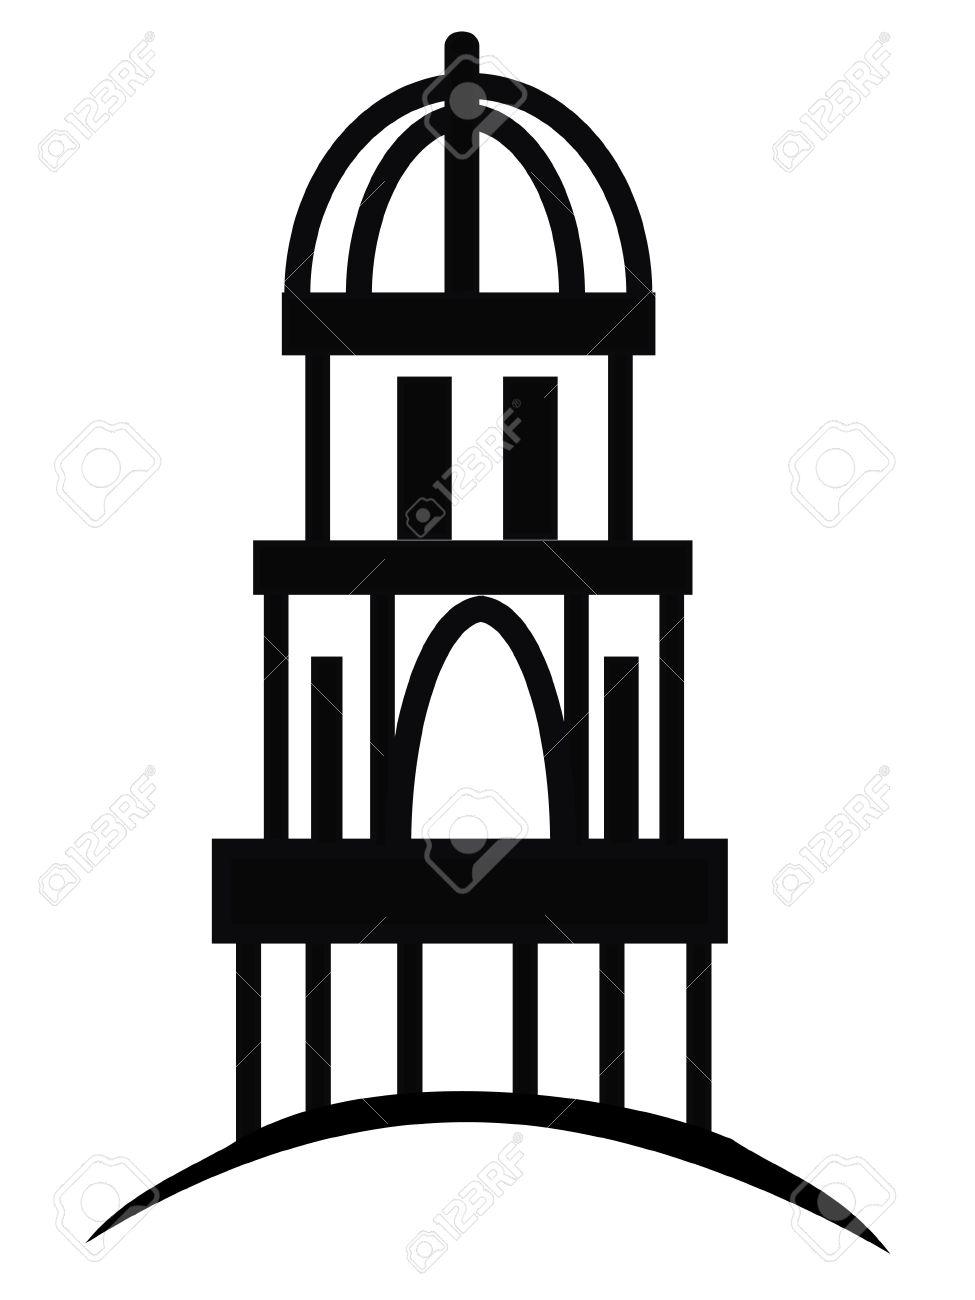 Church Art Logo Stock Vector Illustration And Royalty Free Church.